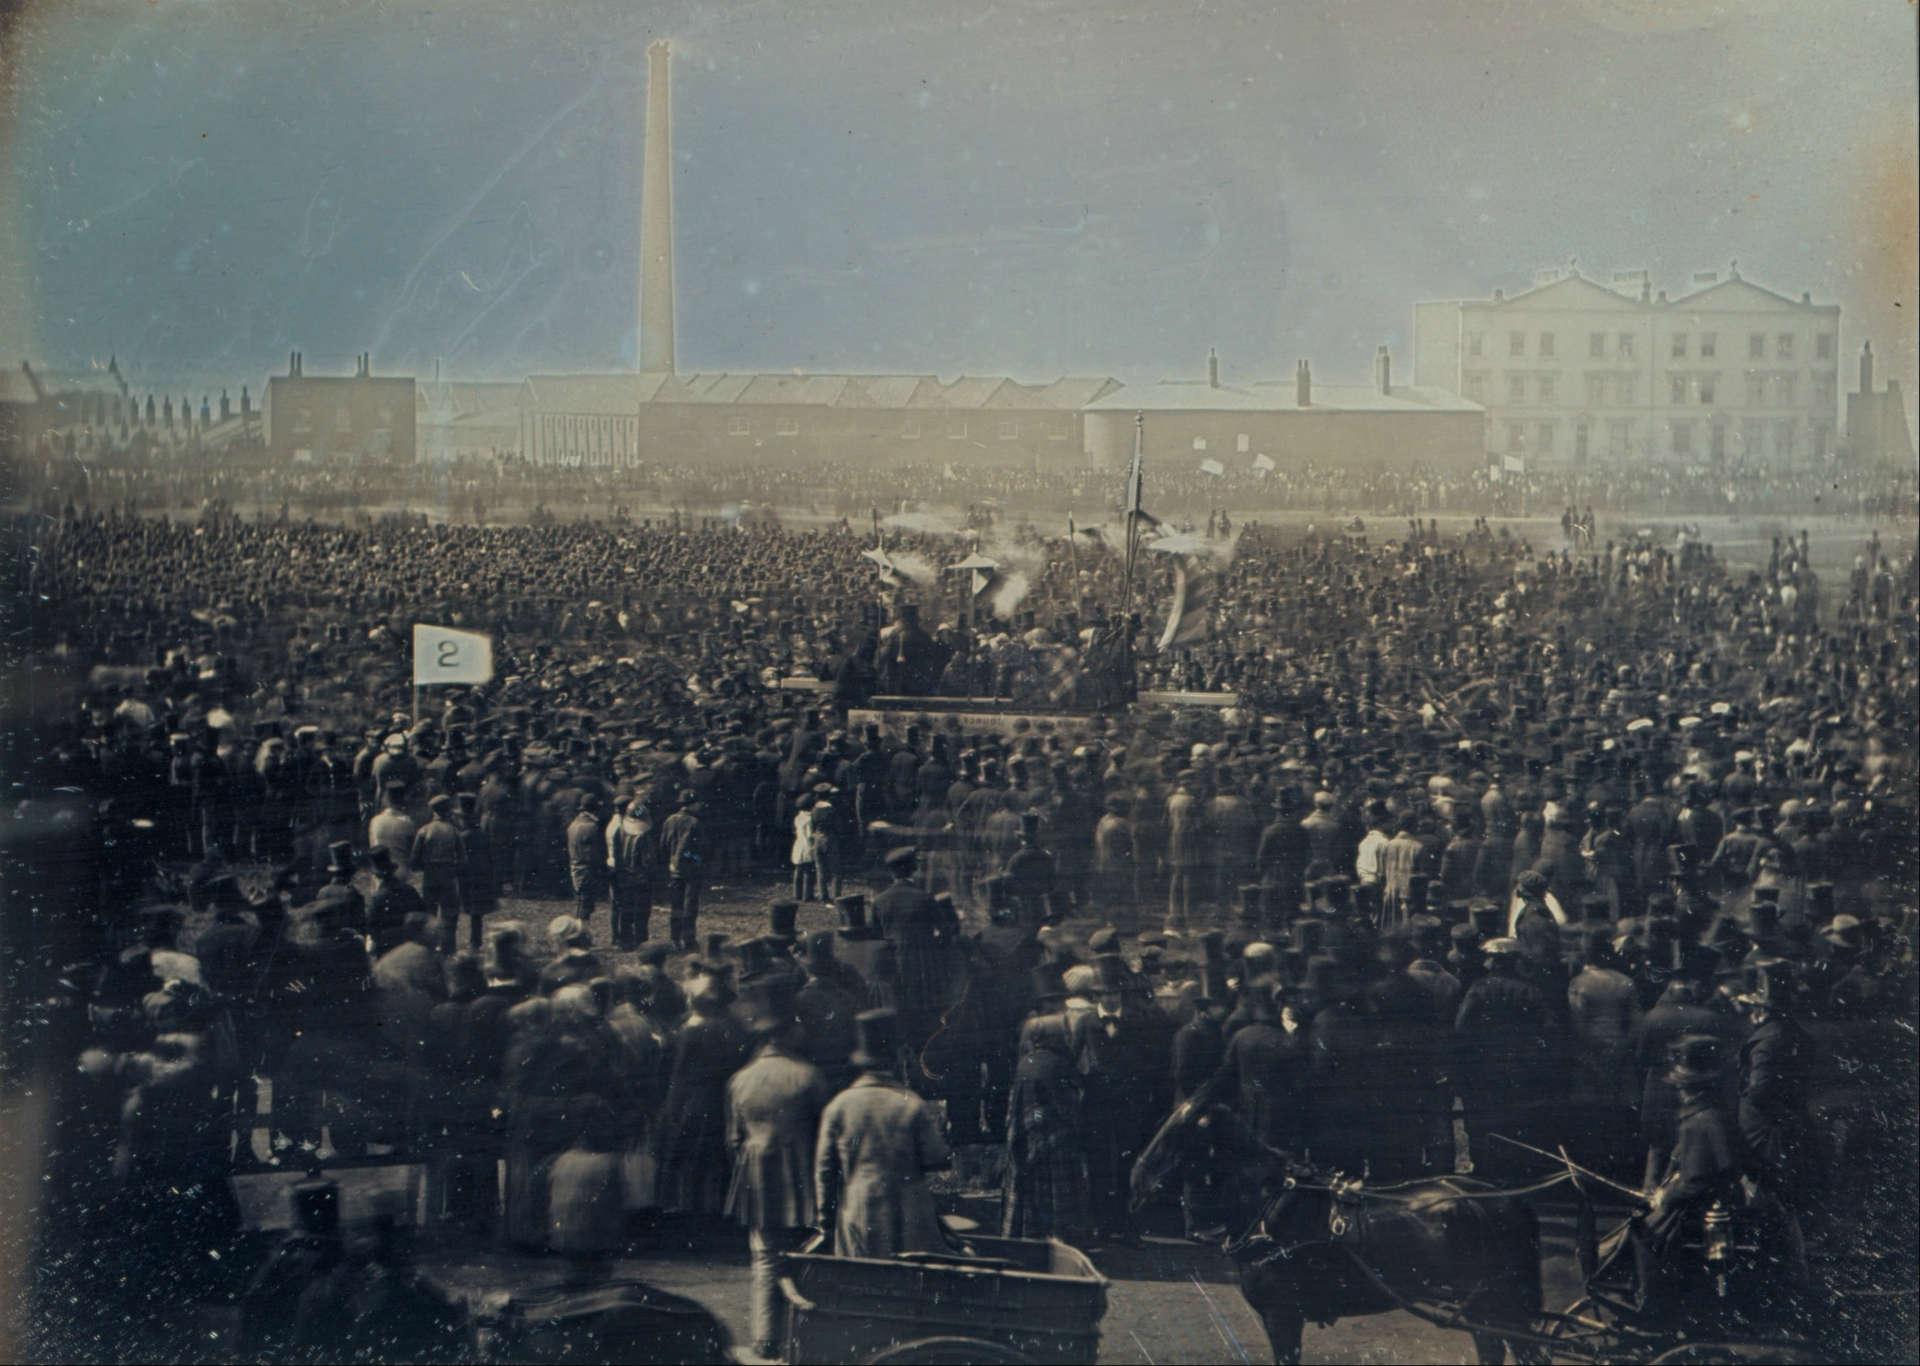 William Kilburn's Daguerreotype photo of the Chartist meeting at Kennington Common on 10 April 1848